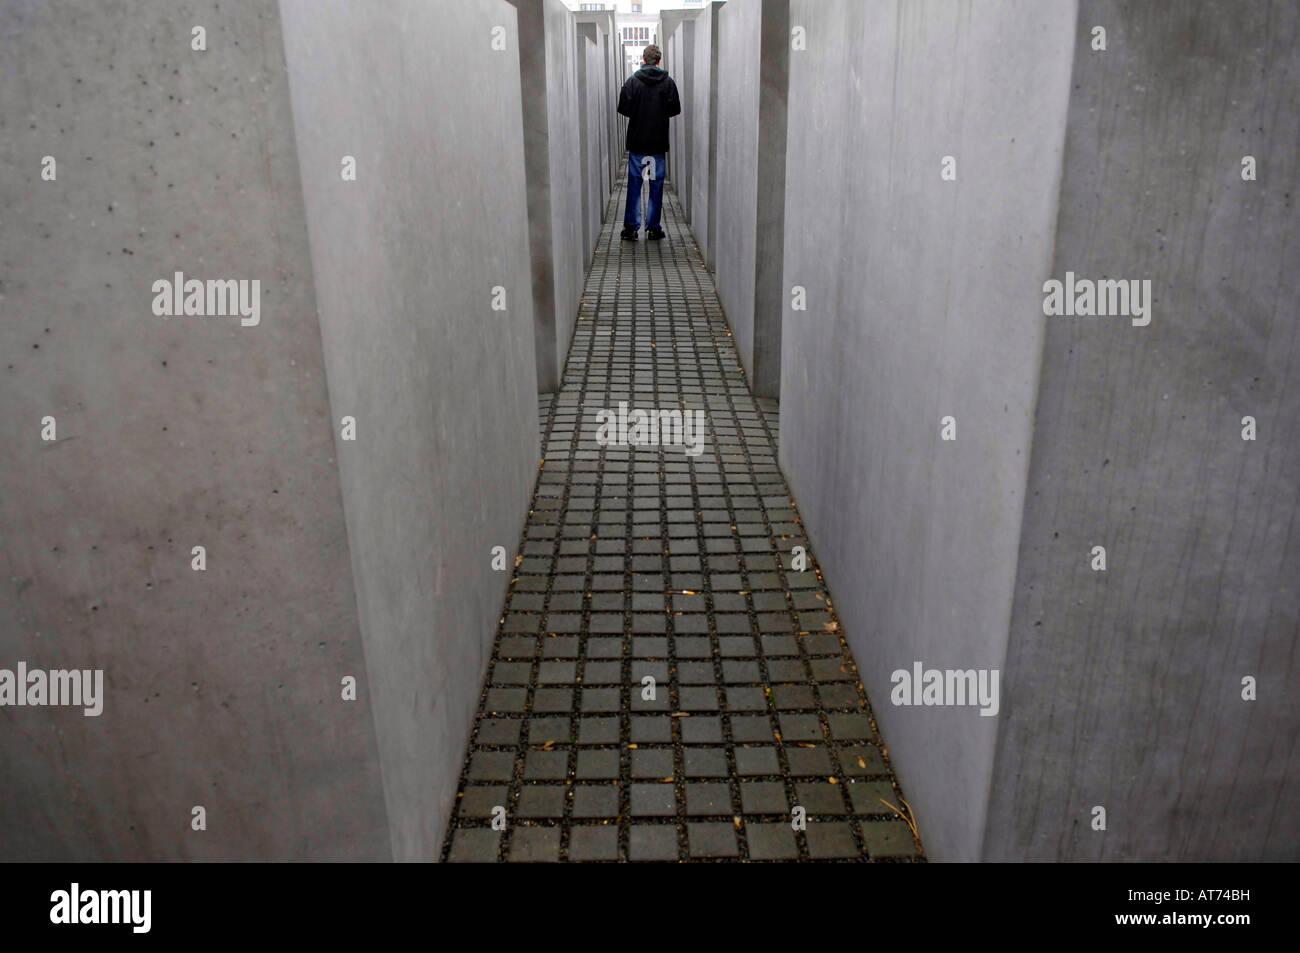 berlin holocaust memorial human figures grey concrete stone jews